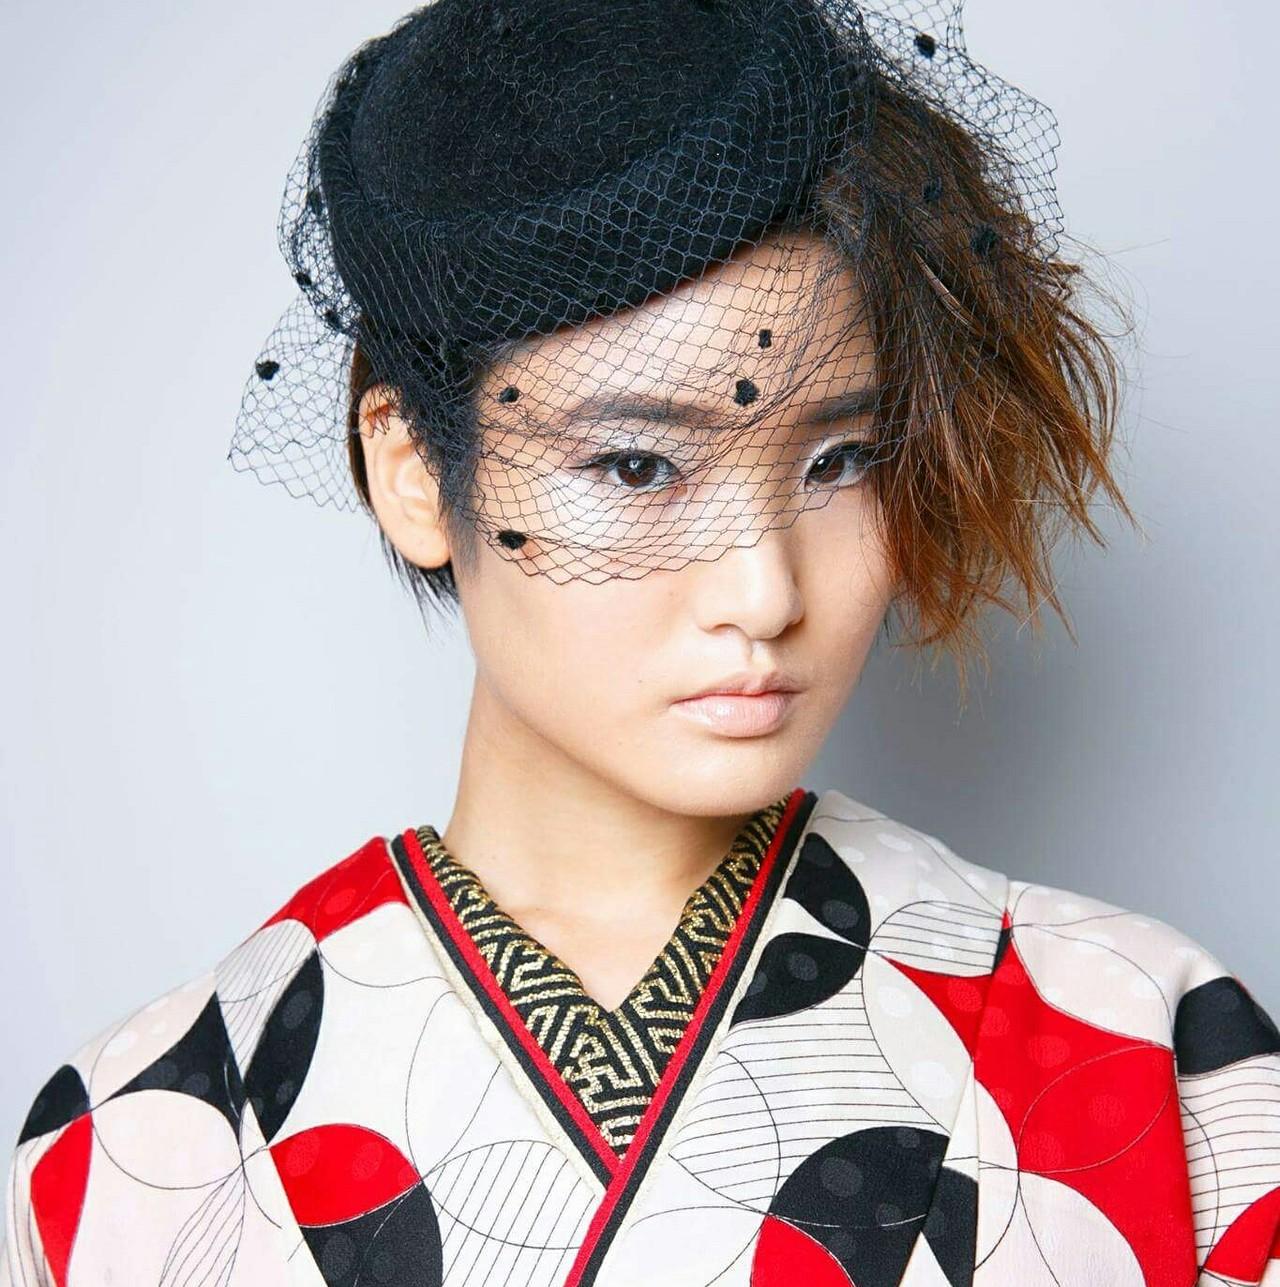 Beauty Salon nagomi 成人式クーポン   ヘア&メイク&着付け 20000円  ヘア&着付け 15000円   http://nagomi-nagomi.biz